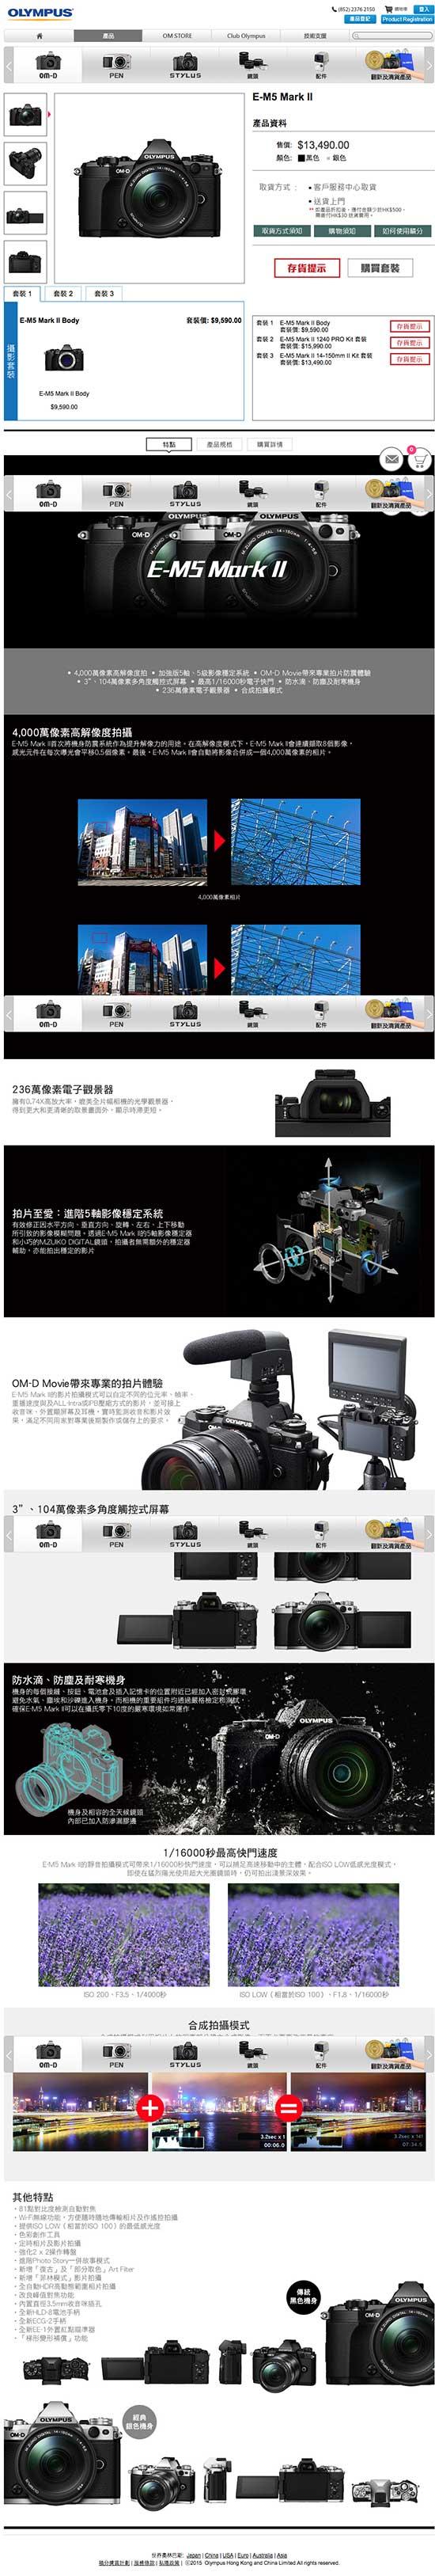 Olympus-E-M5-Mark-II-camera